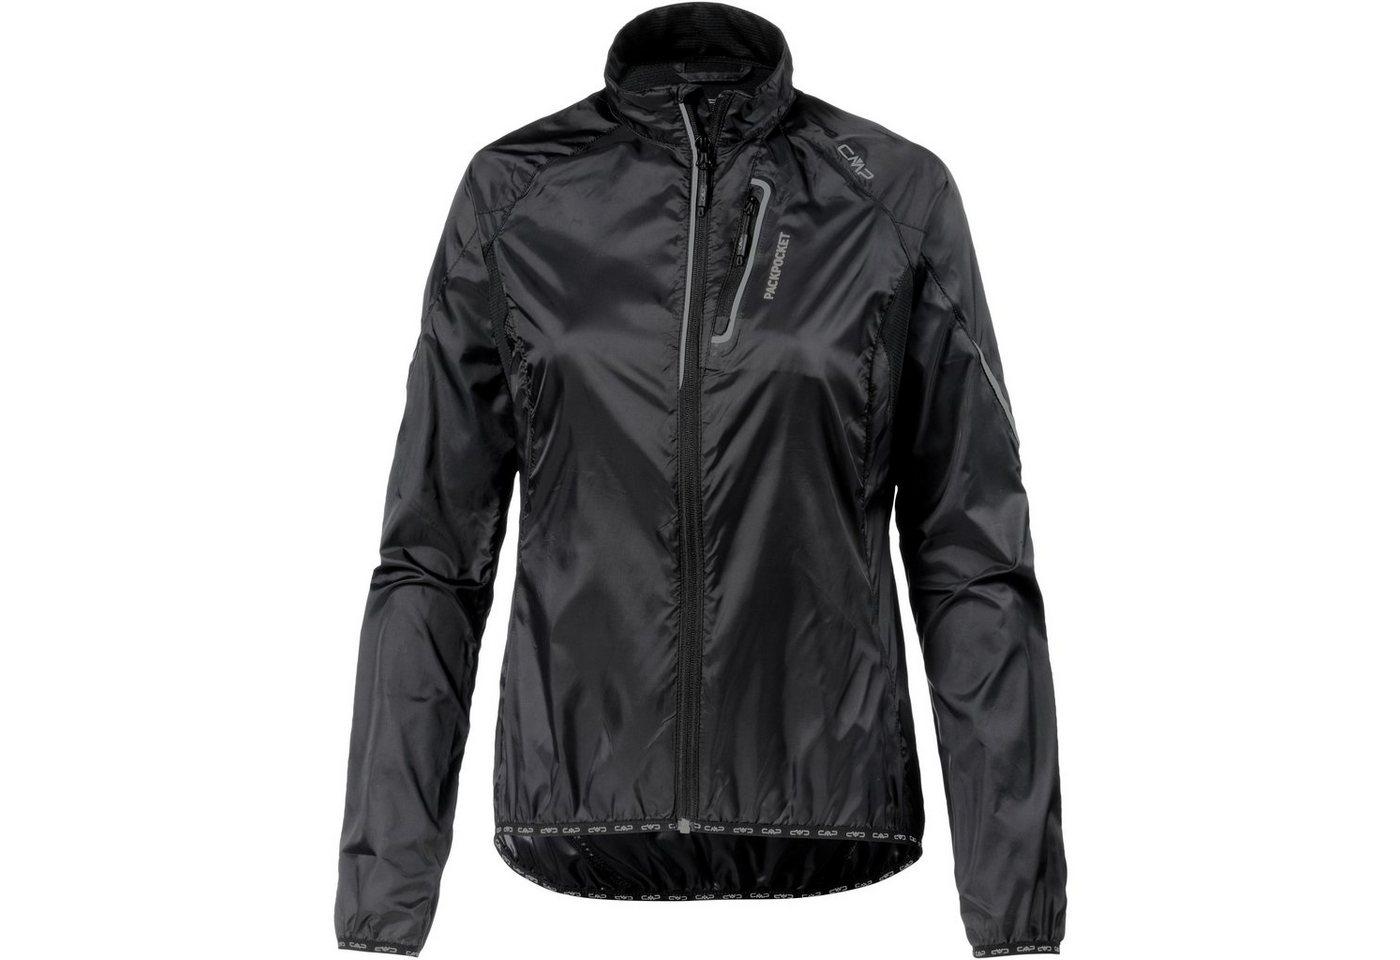 CMP Fahrradjacke »TRAIL JACKET« | Sportbekleidung > Sportjacken > Fahrradjacken | Schwarz | Polyester - Elastan | CMP